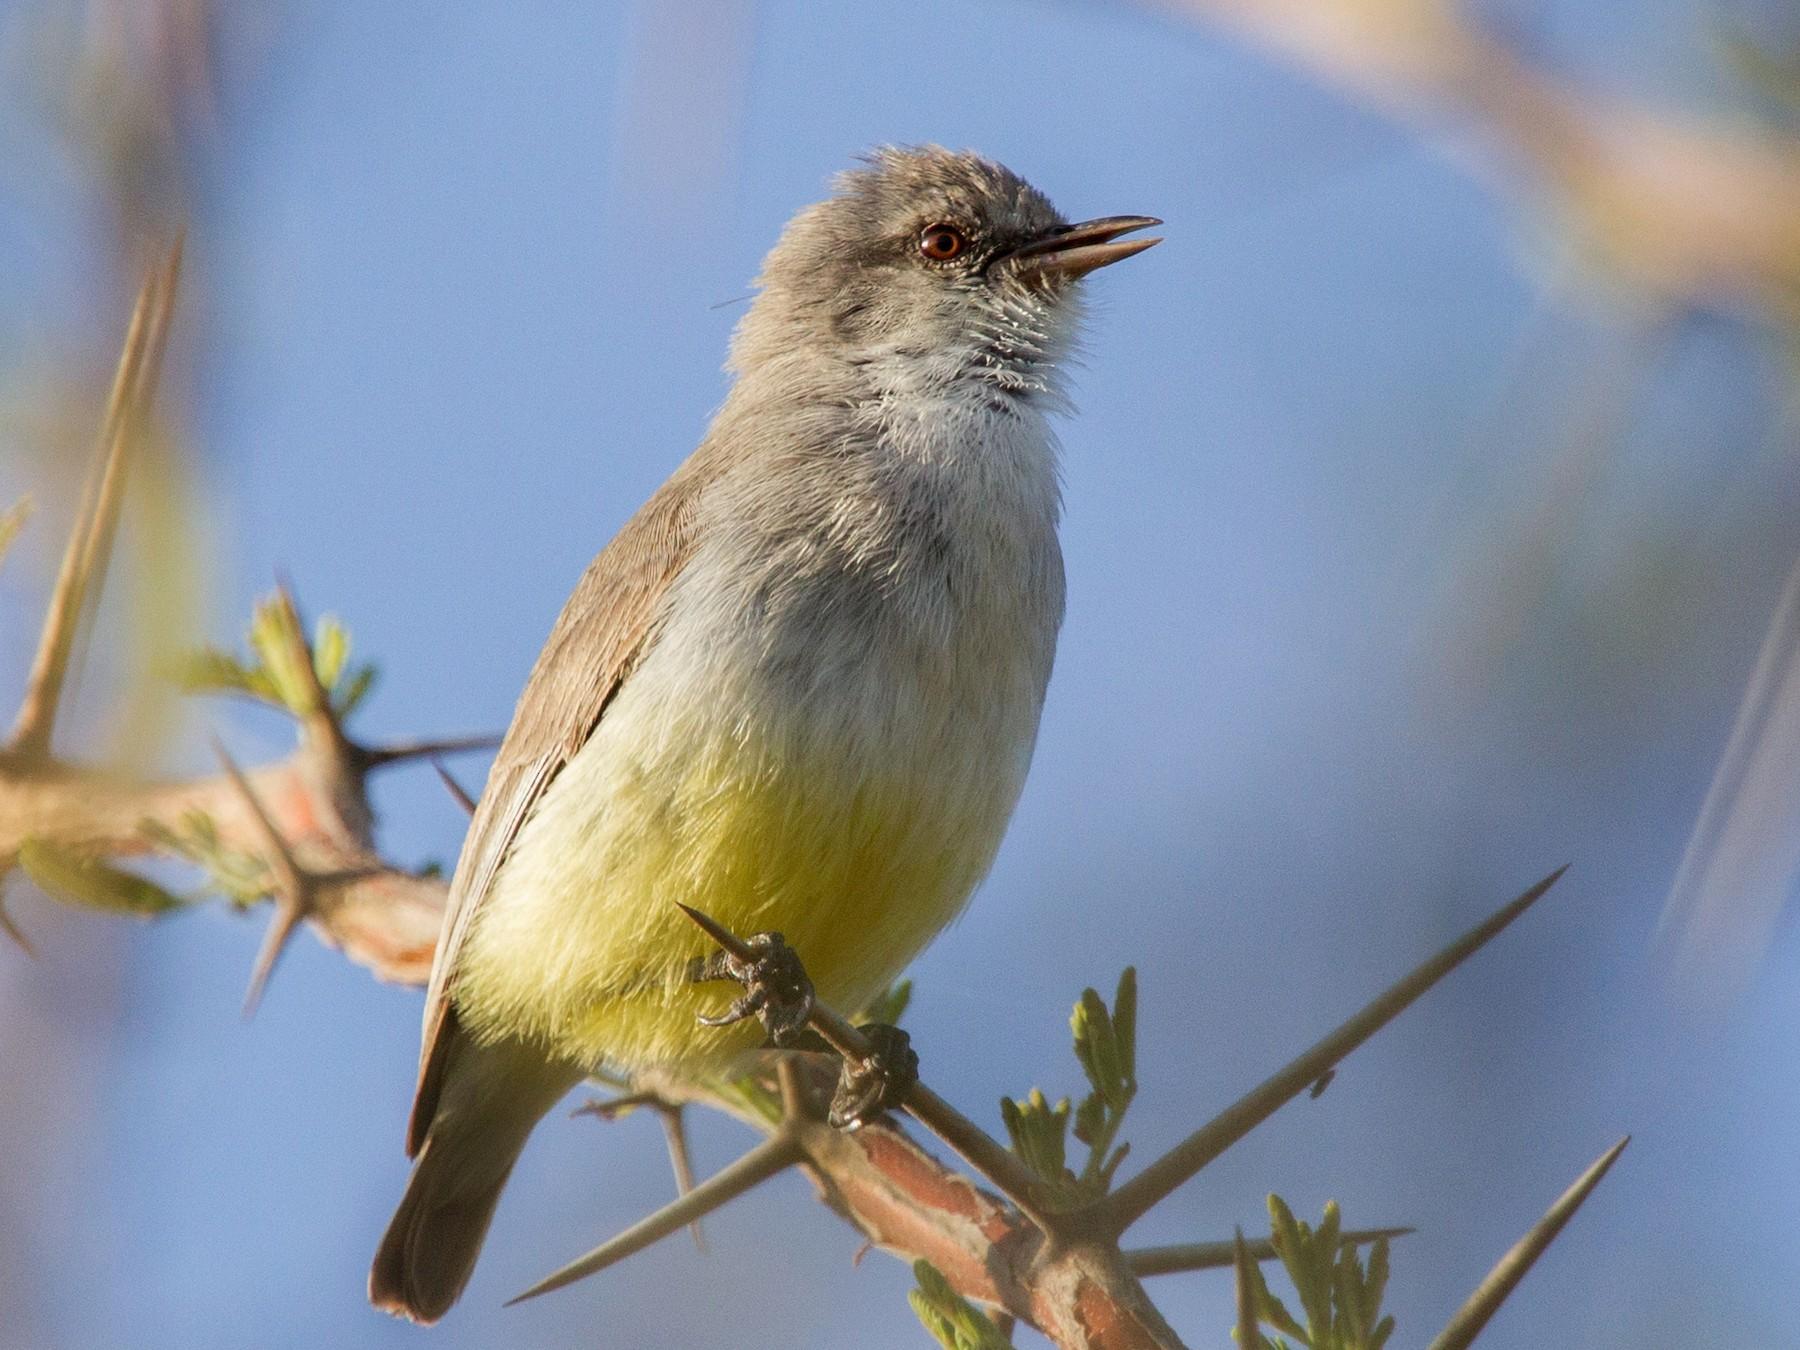 Yellow-vented Eremomela - Simon Colenutt